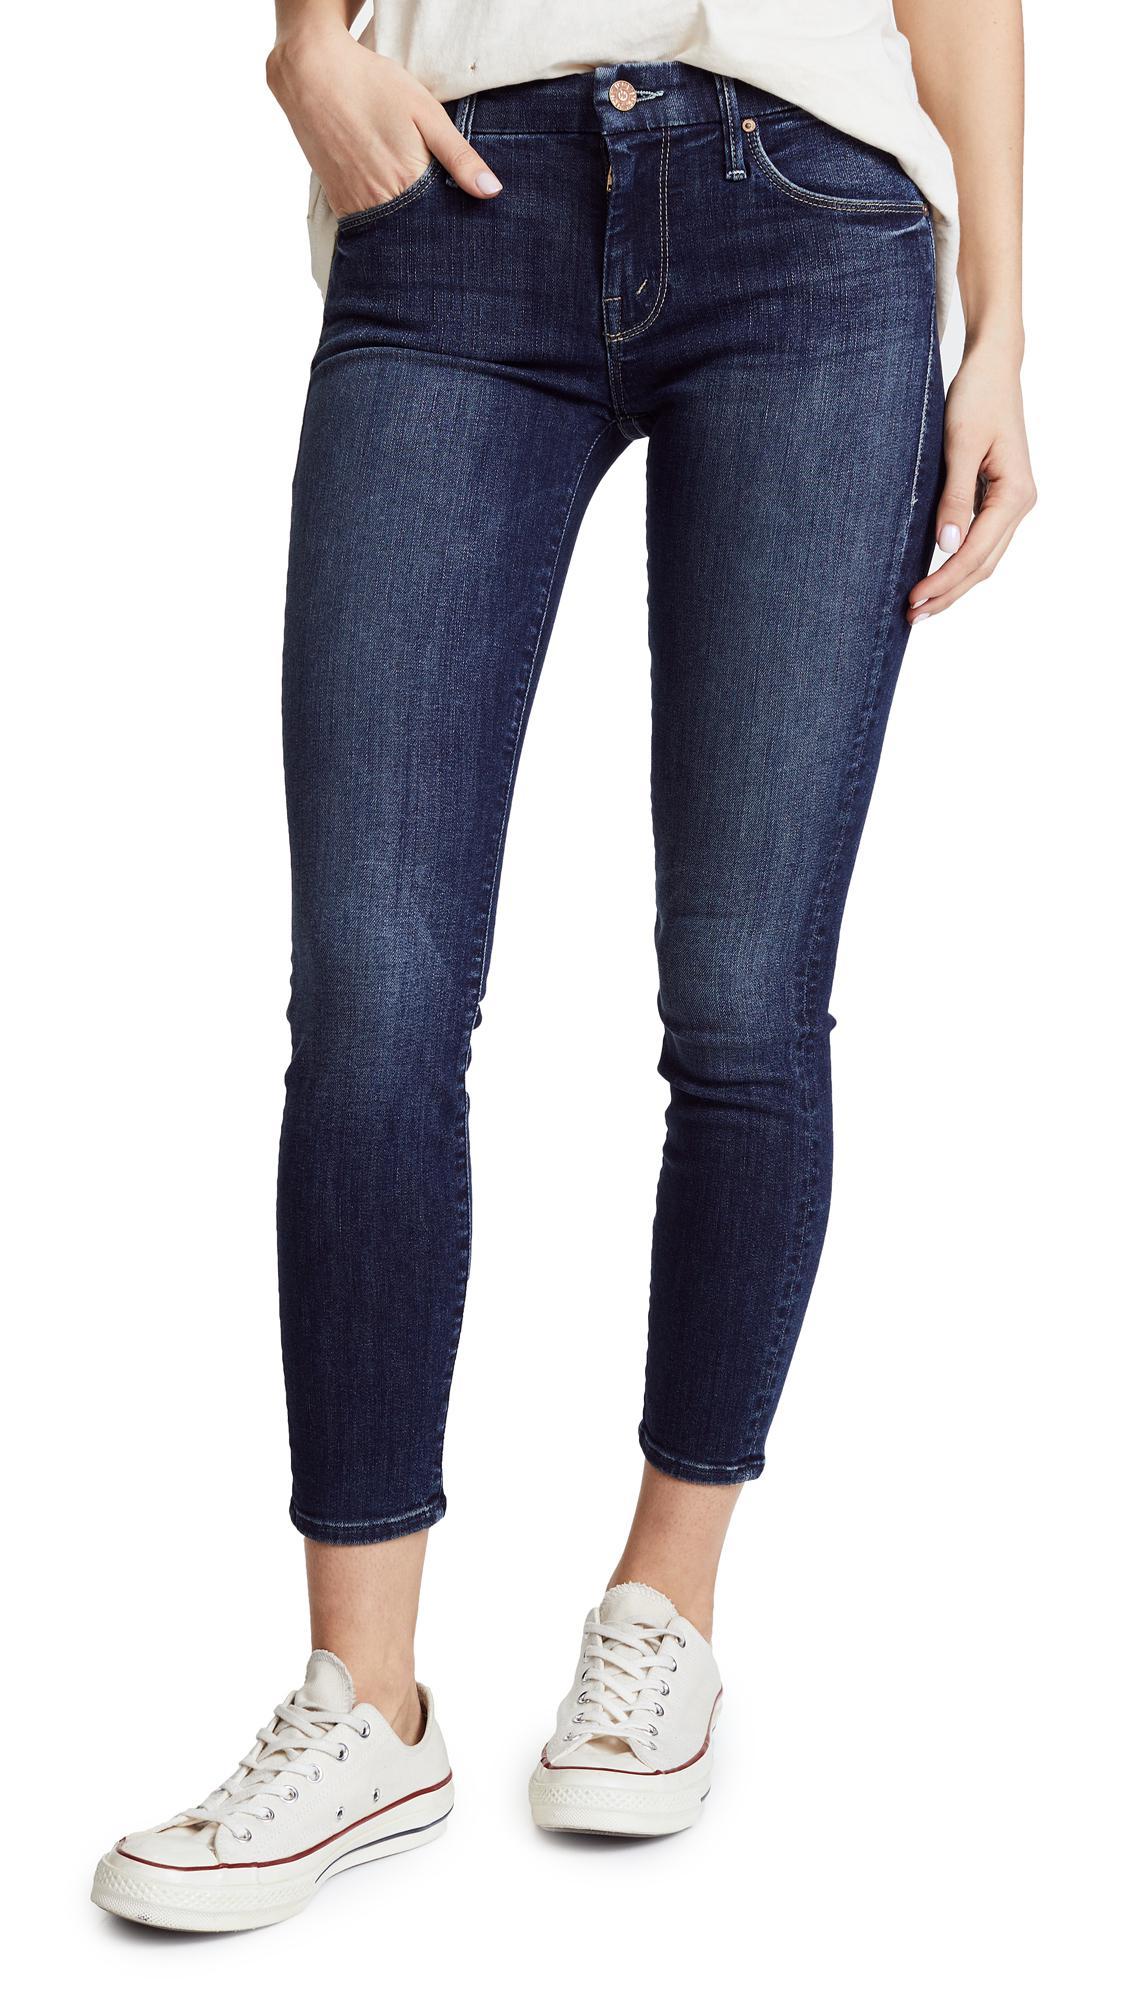 Mother Denim Looker Crop Skinny Jeans in Blue